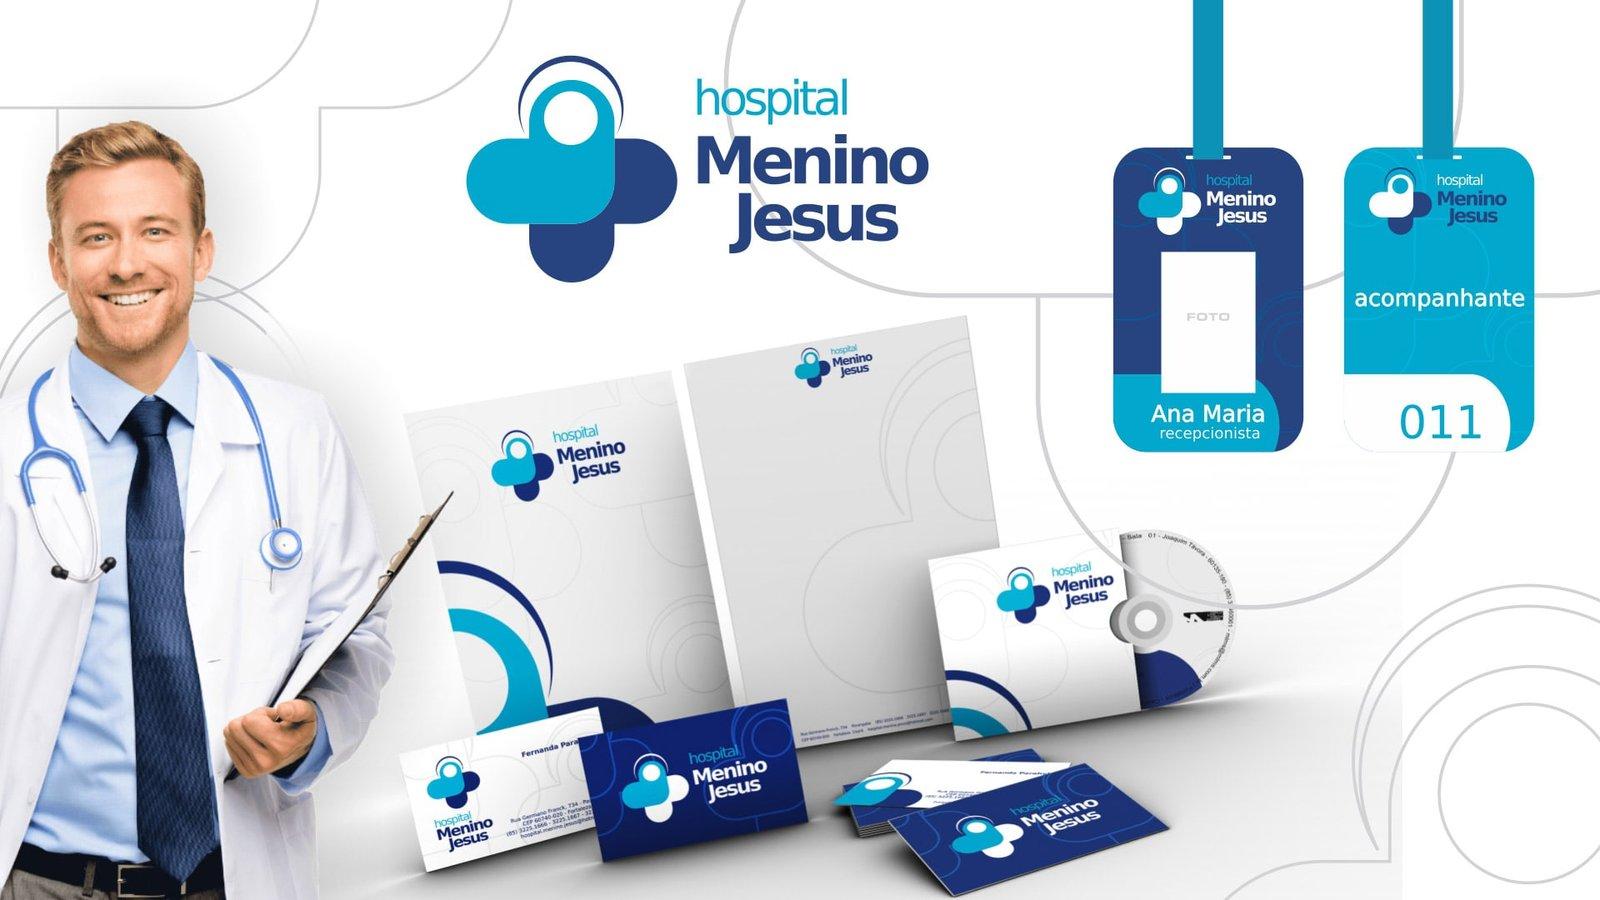 MLMS Marcar Hospital Menino Jesus